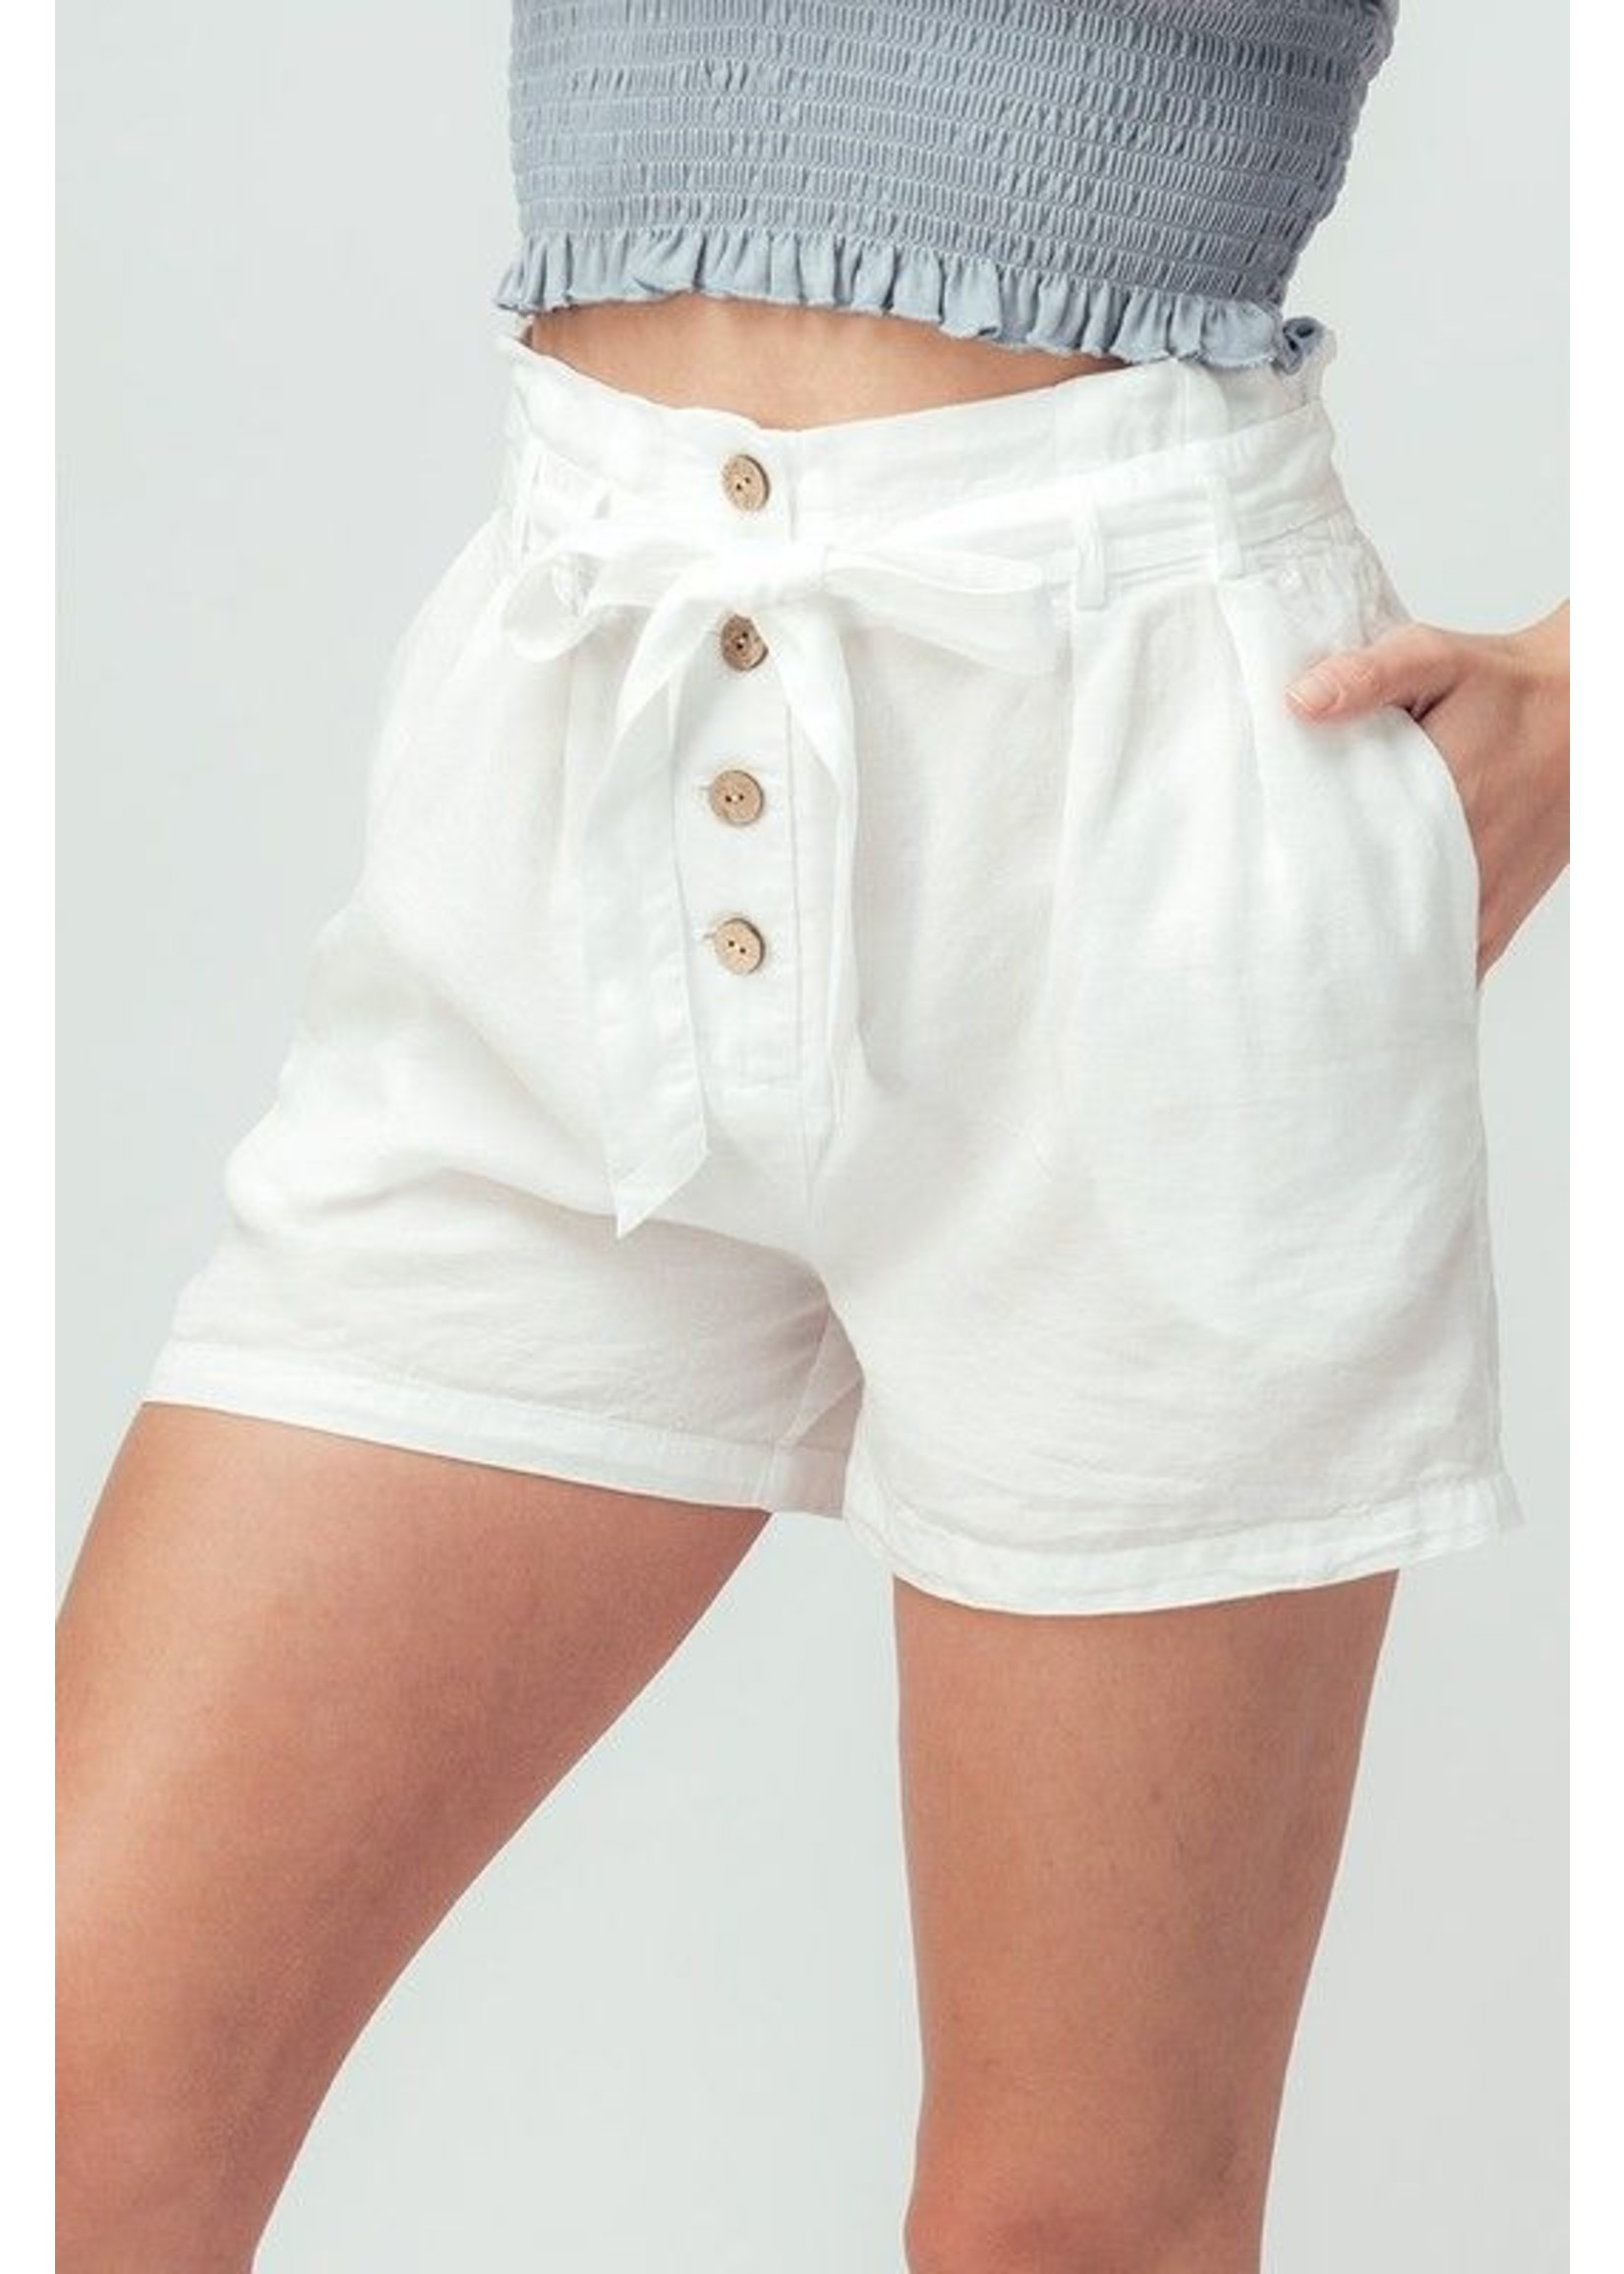 trend : notes Casidi Paper Bag Shorts White